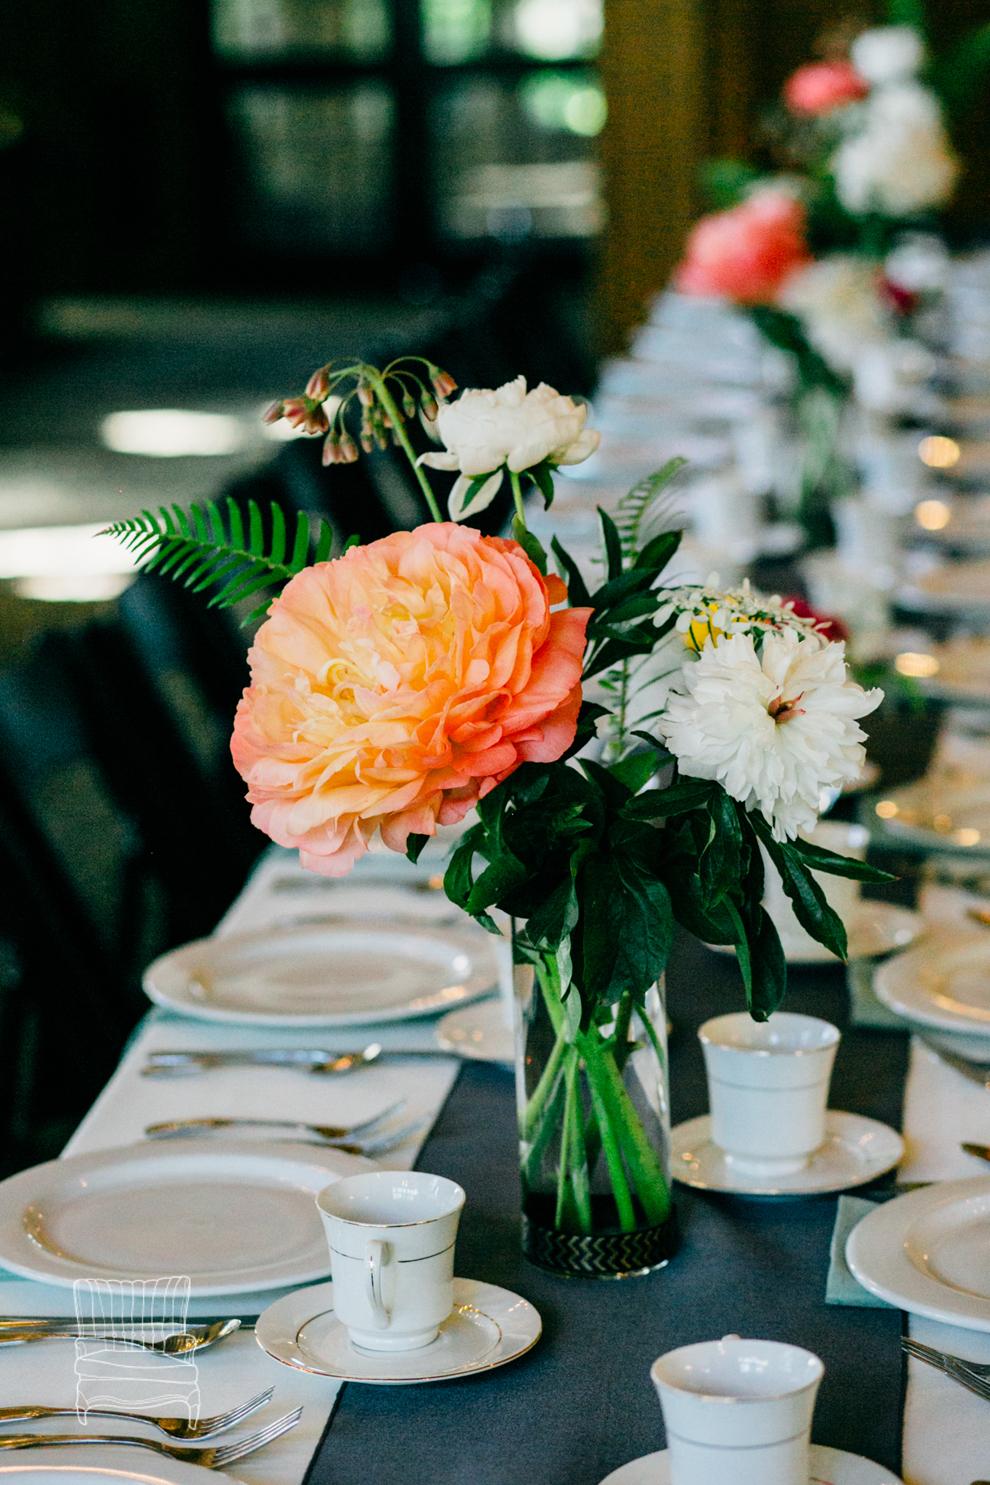 015-lairmont-manor-bellingham-washington-wedding-venue-katheryn-moran-photography-marketing.jpg